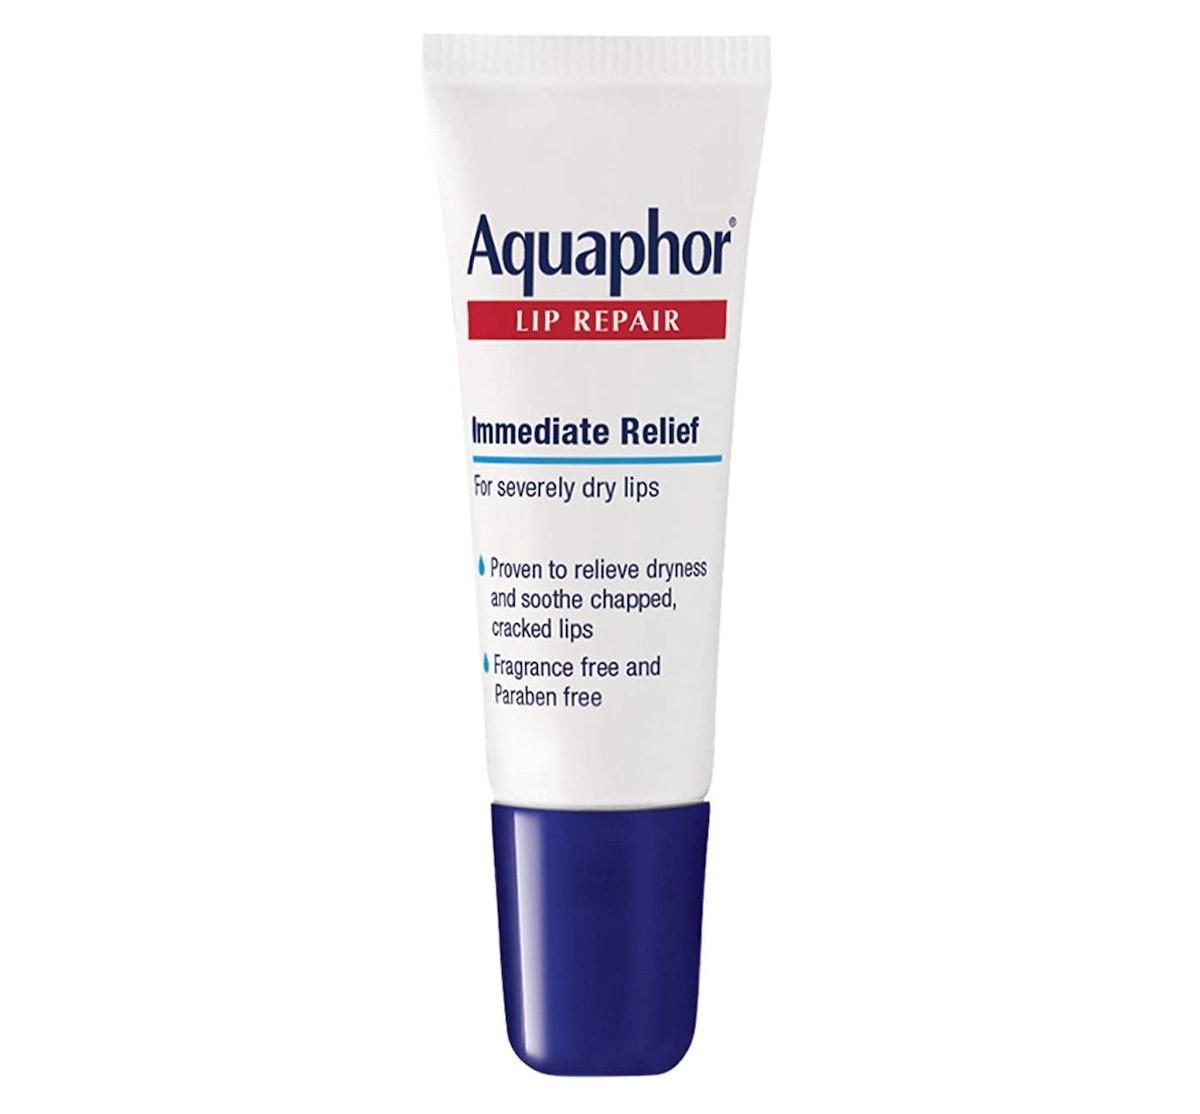 Aquaphor Lip Repair Ointment